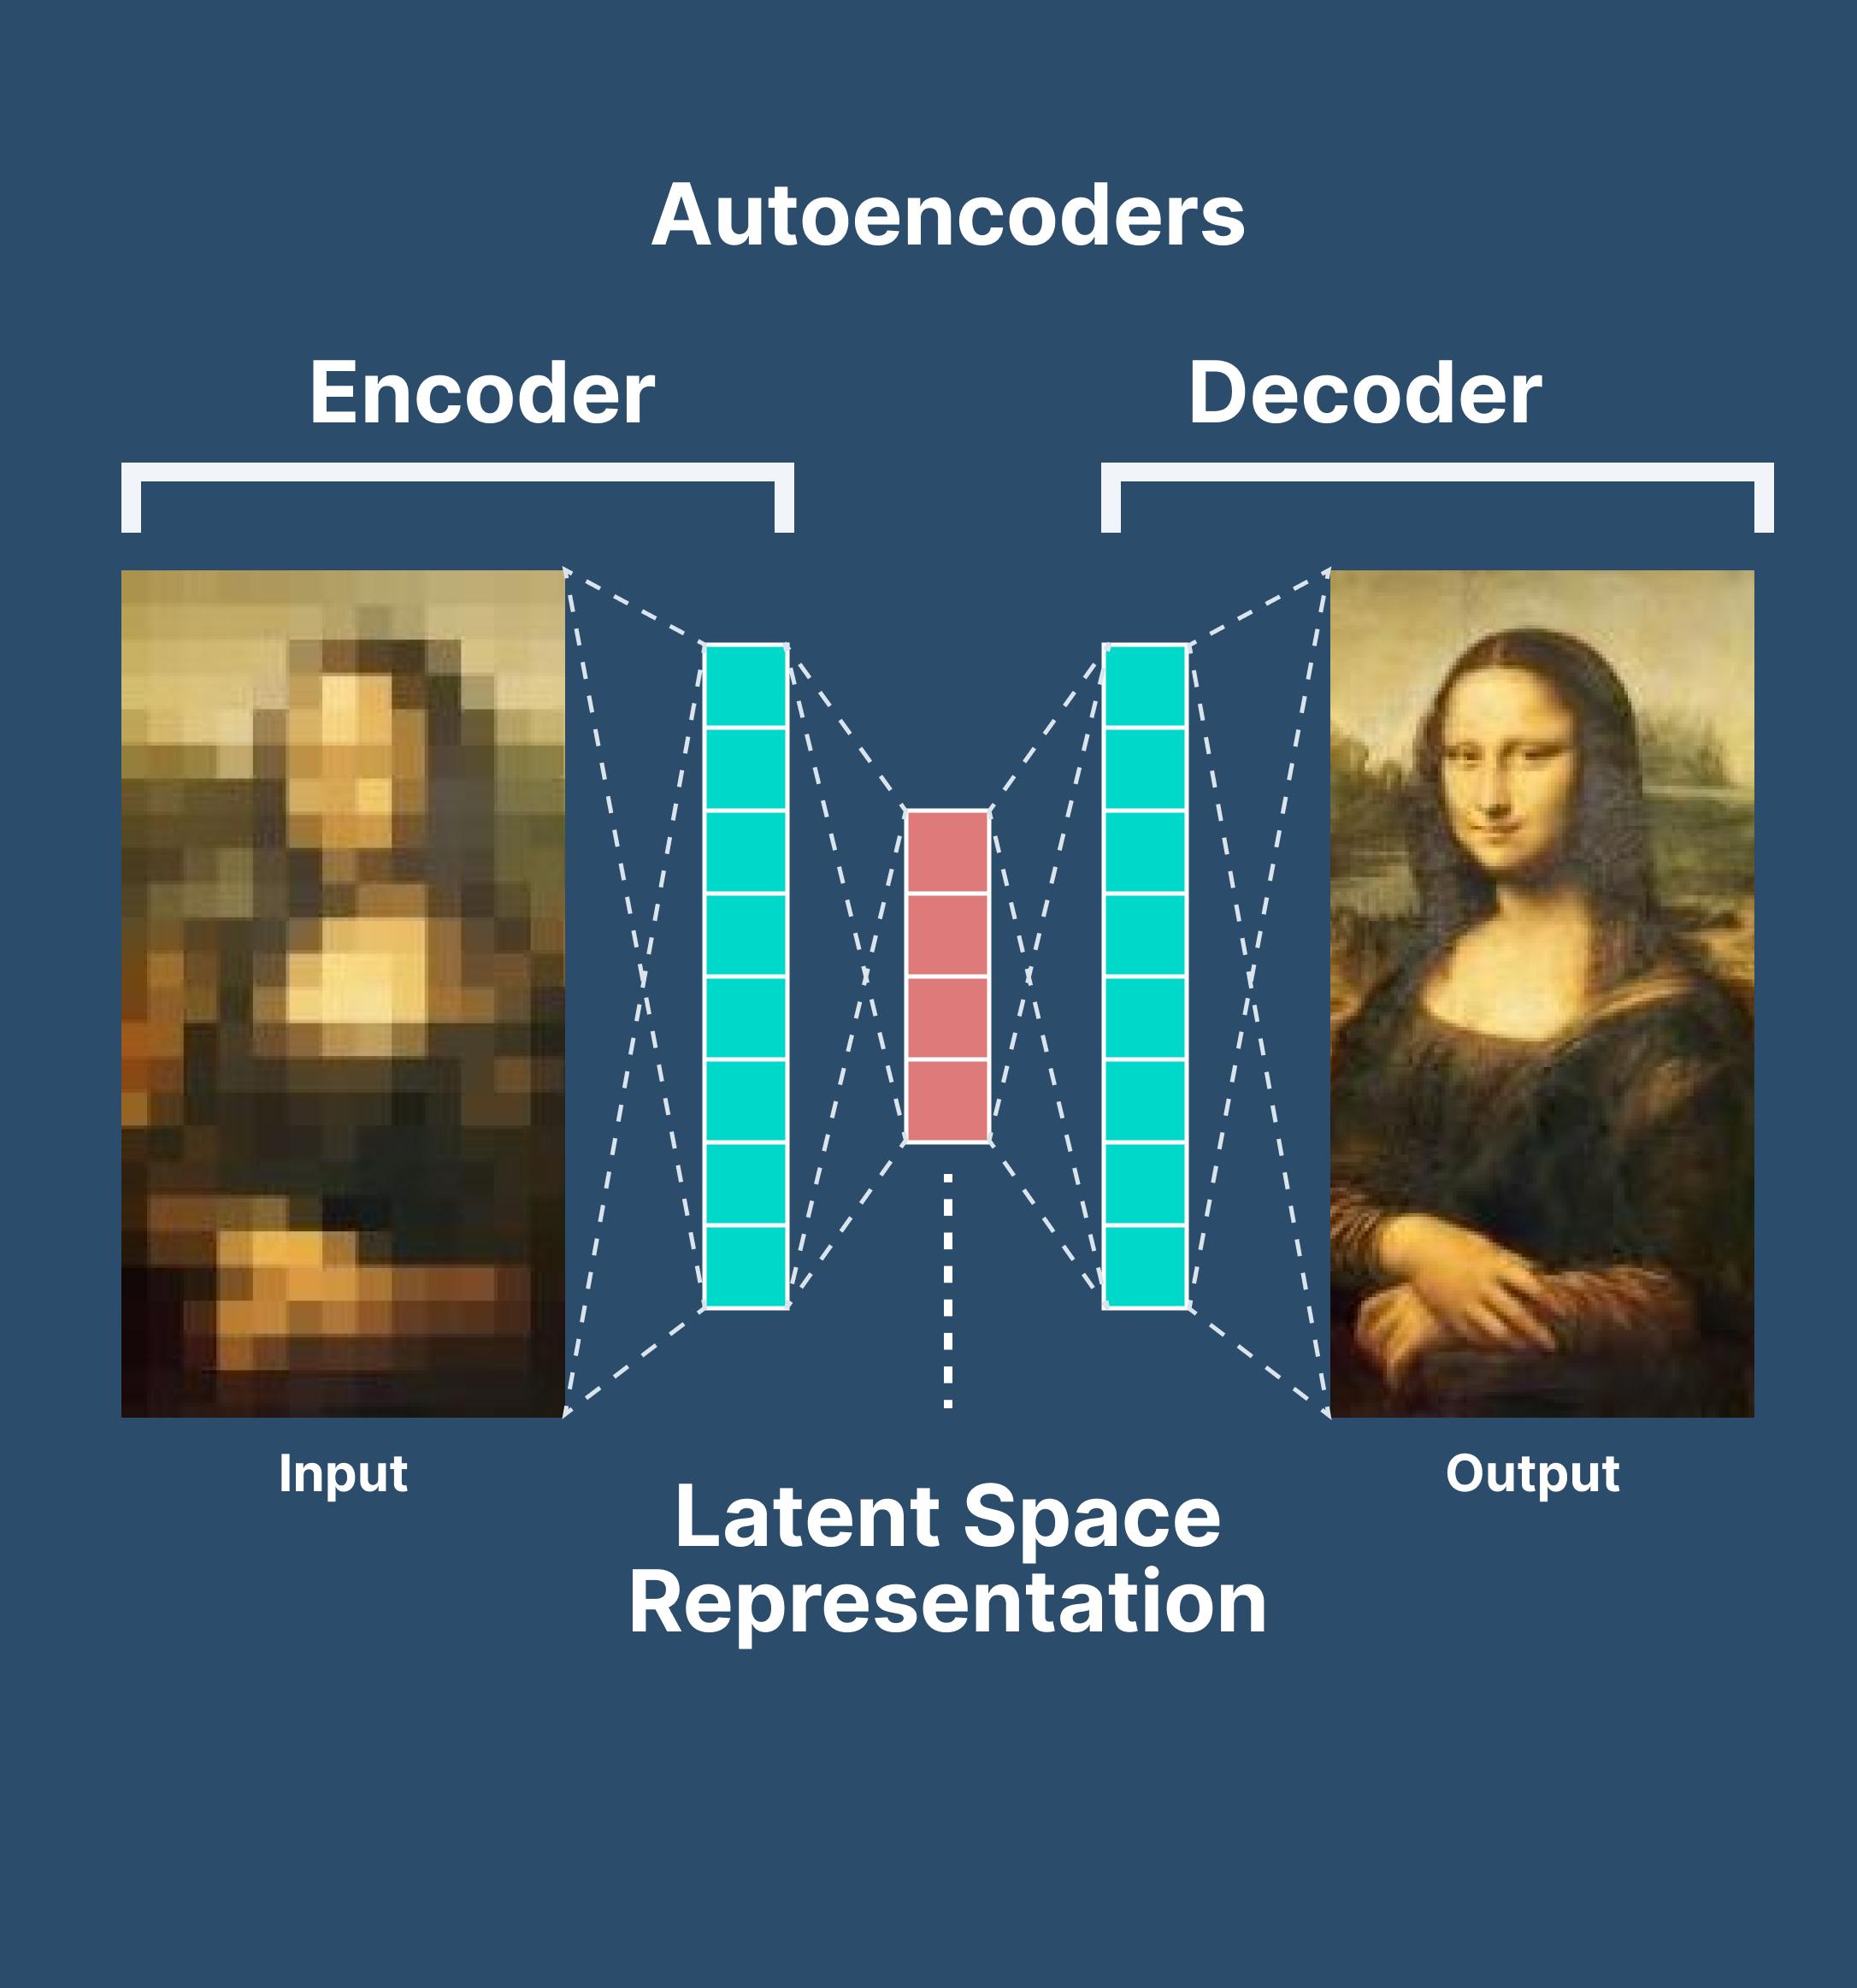 How does an autoencoder work